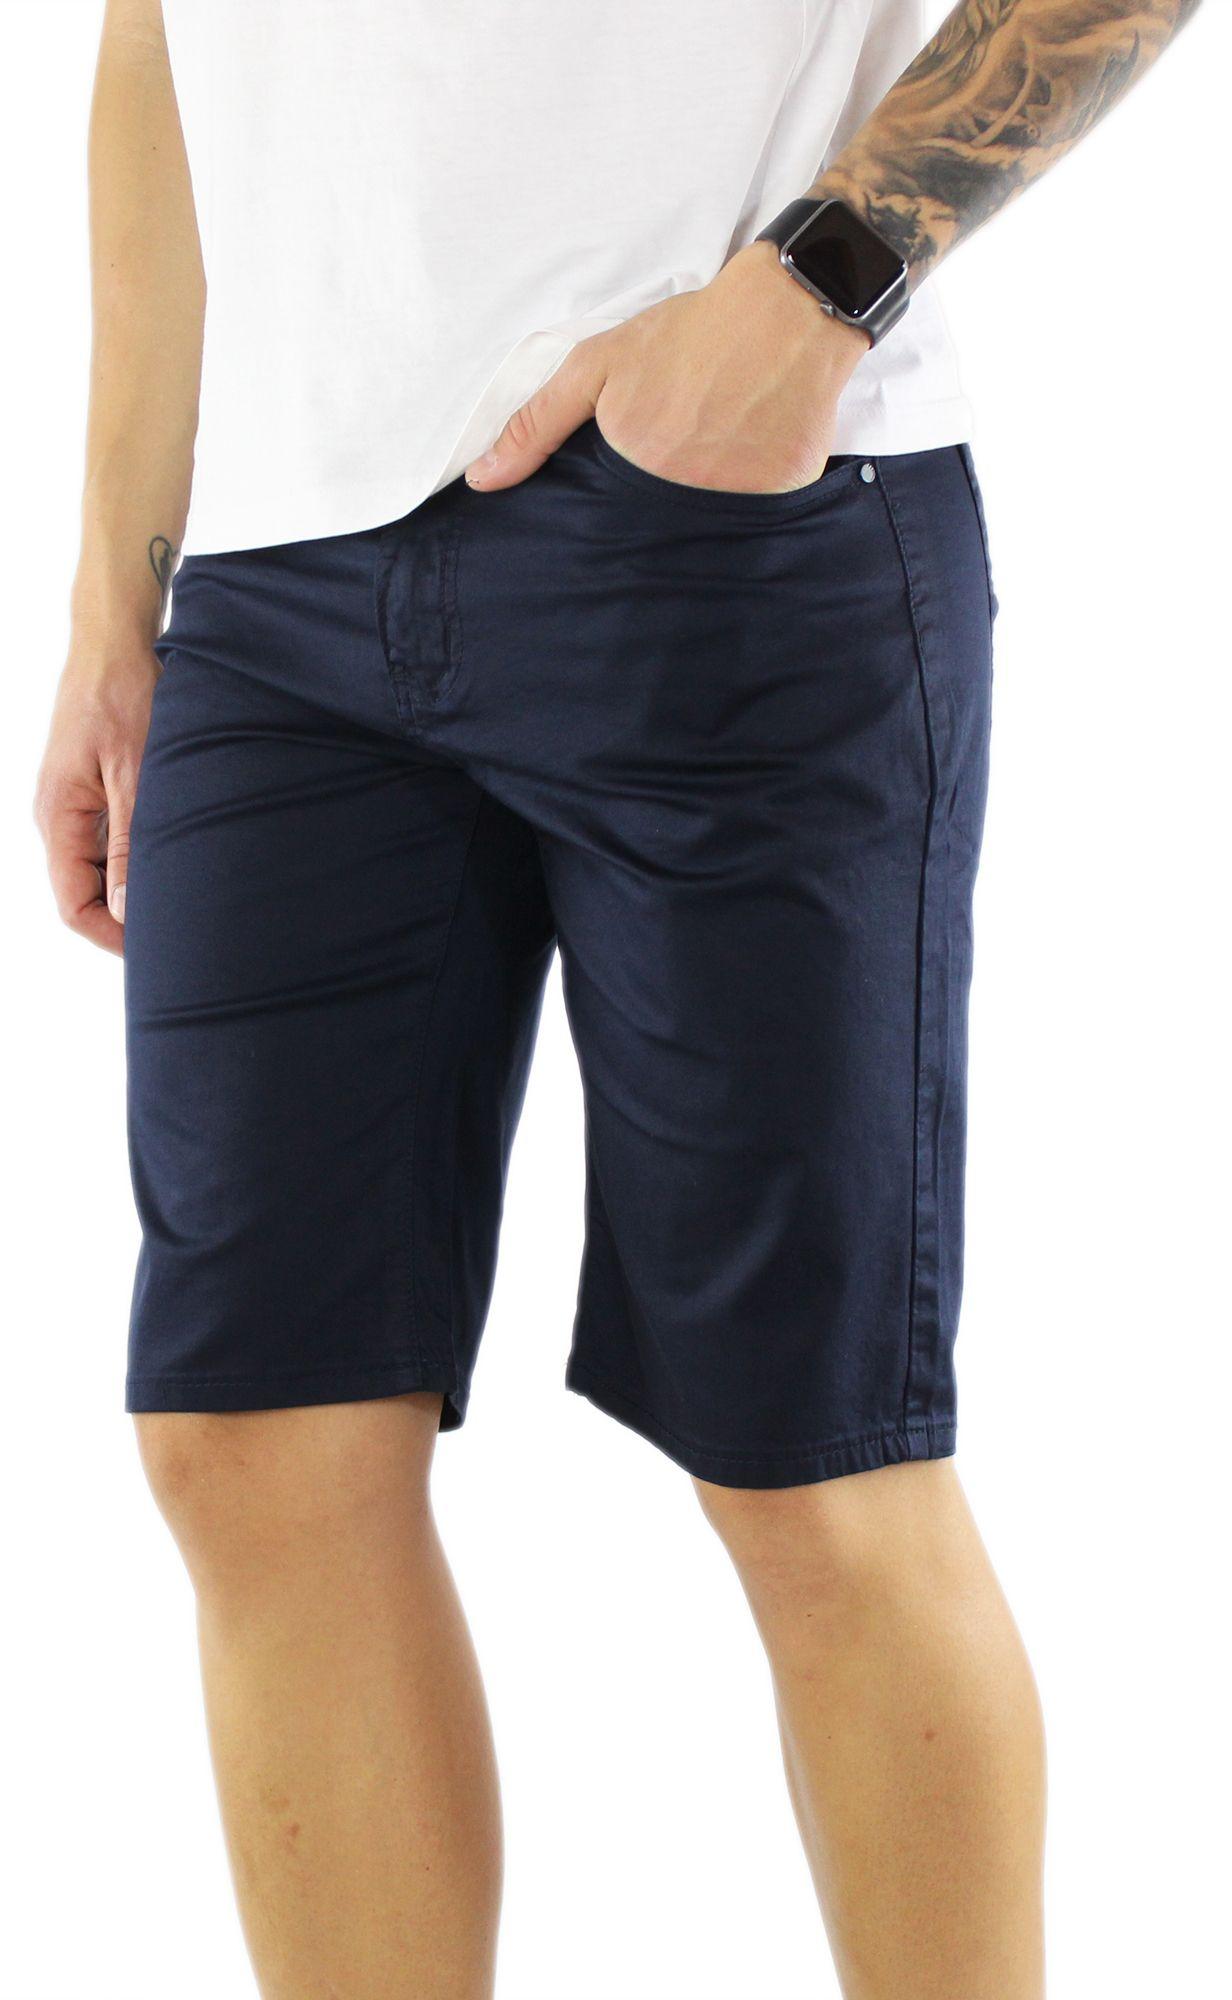 Bermuda-Uomo-Cotone-Slim-Fit-Pantalone-Corto-Shorts-Pantaloncini-Casual miniatuur 9